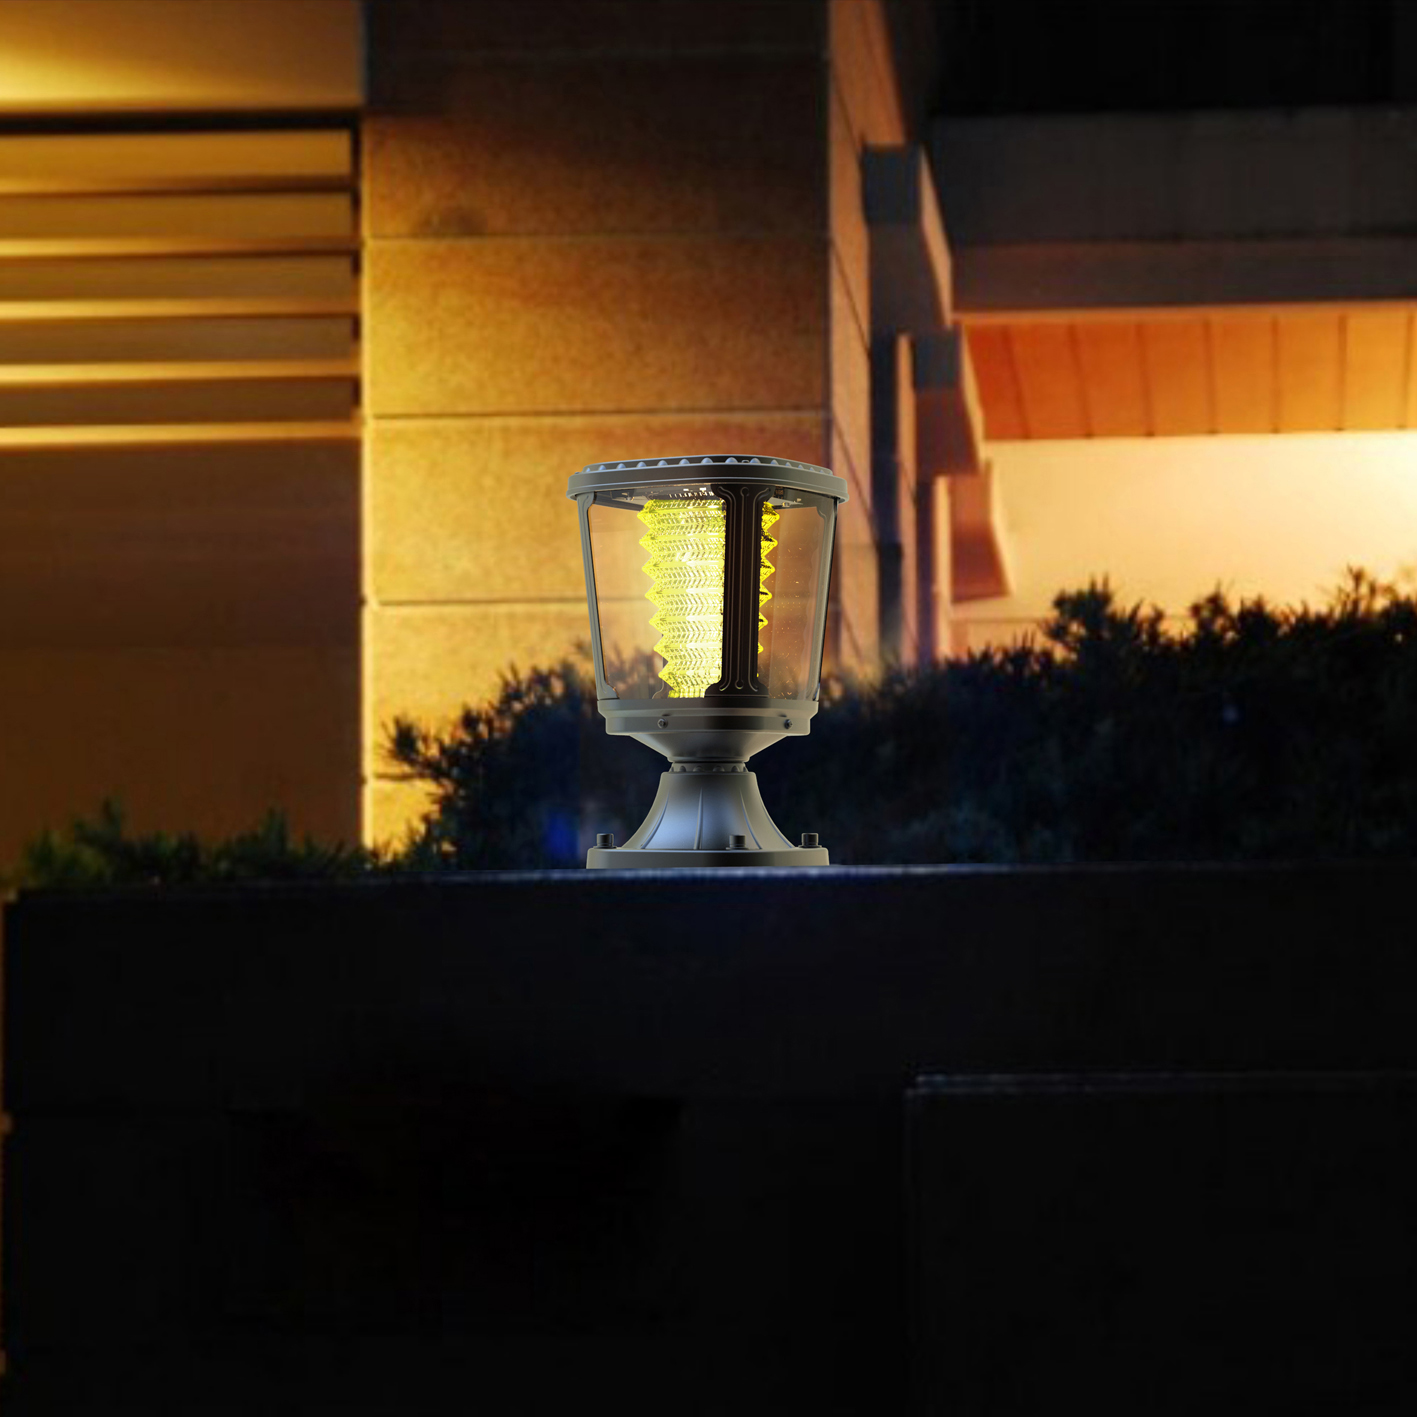 Sgl 01 Solar Garden Wall Light